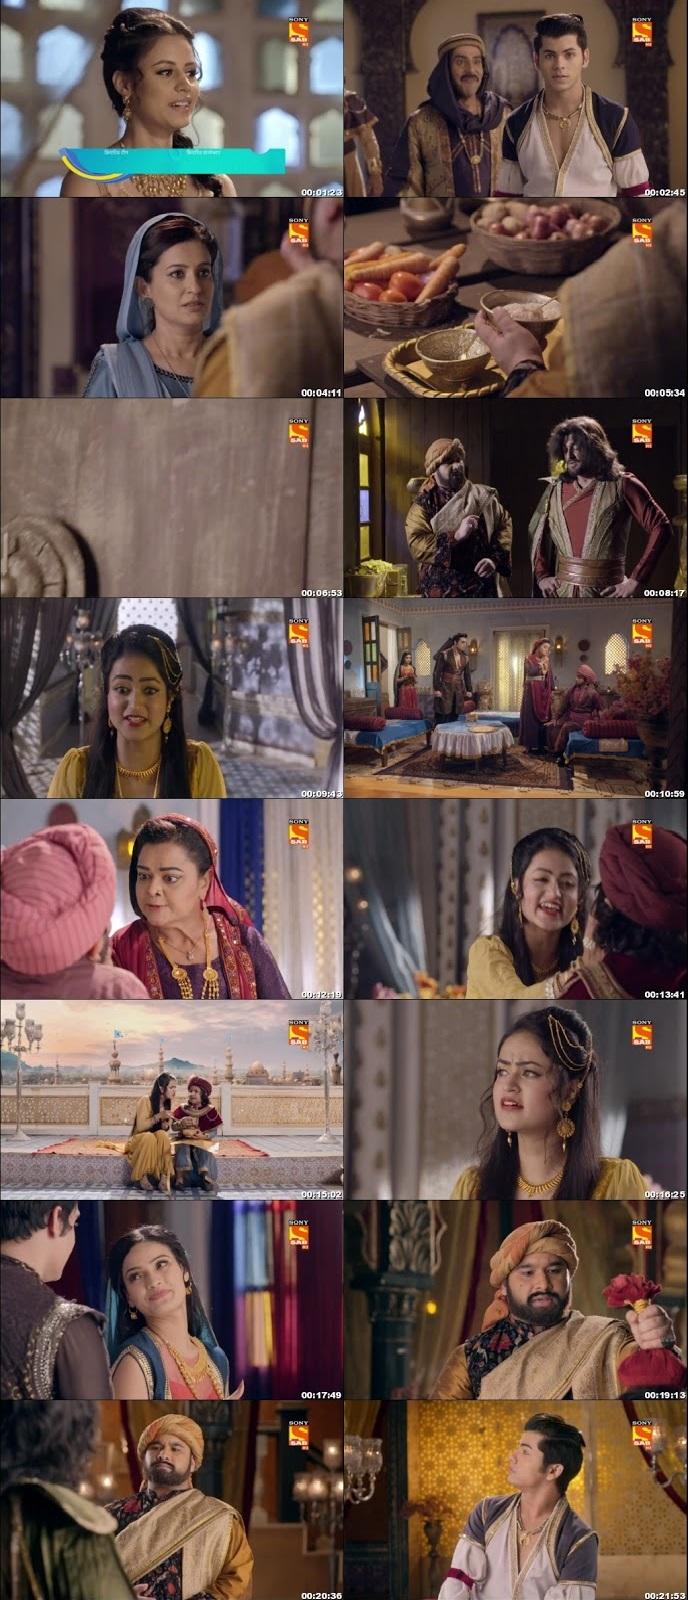 Screenshots Of Hindi Show Aladdin – Naam Toh Suna Hoga 2019 Episode 235 | Episode 236 | Episode 235 300MB 720P HD